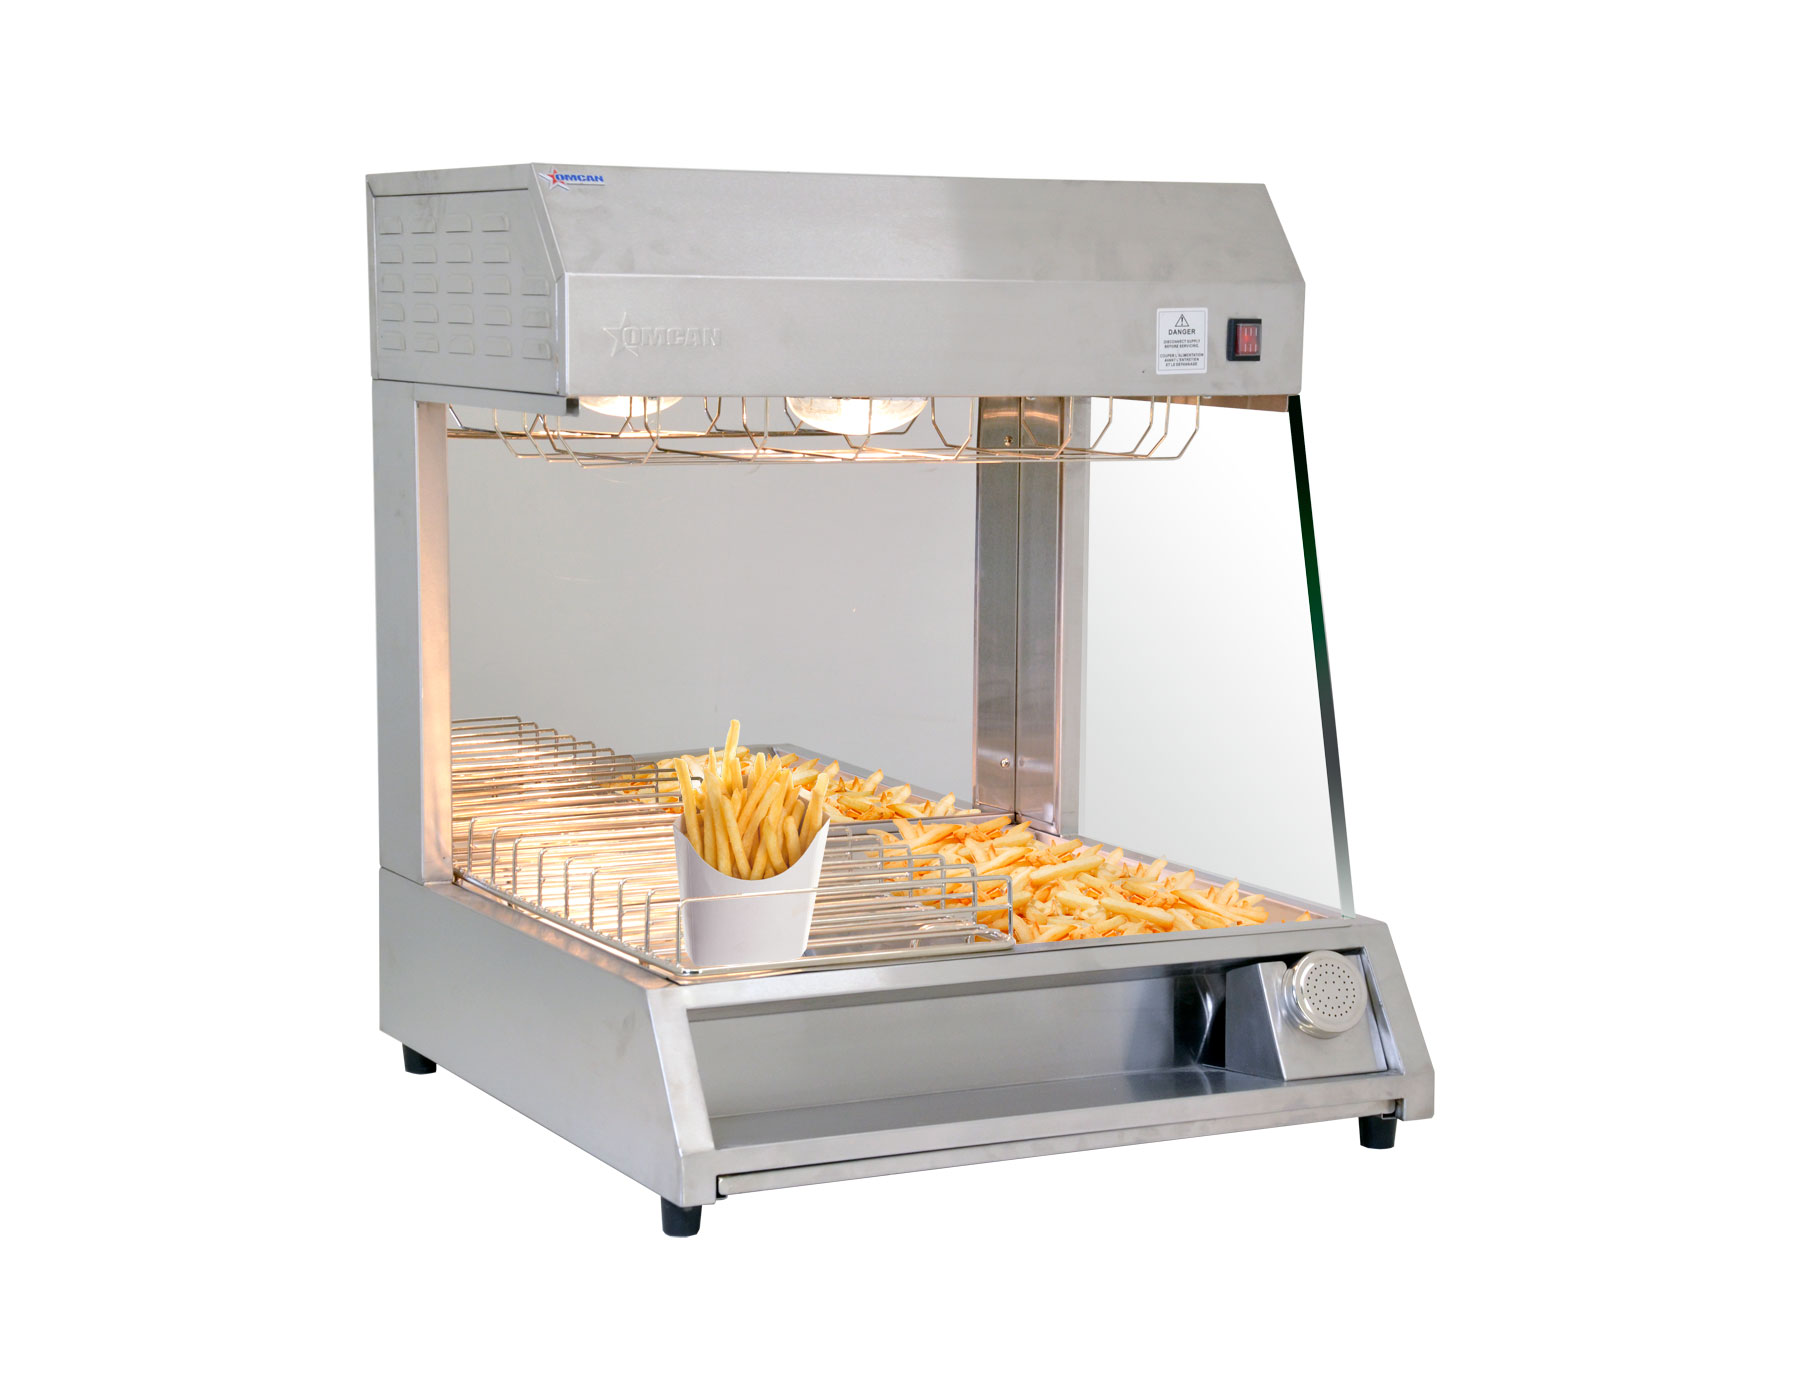 Omcan FWCN0300C food equipment > food warmers > fry crisp station